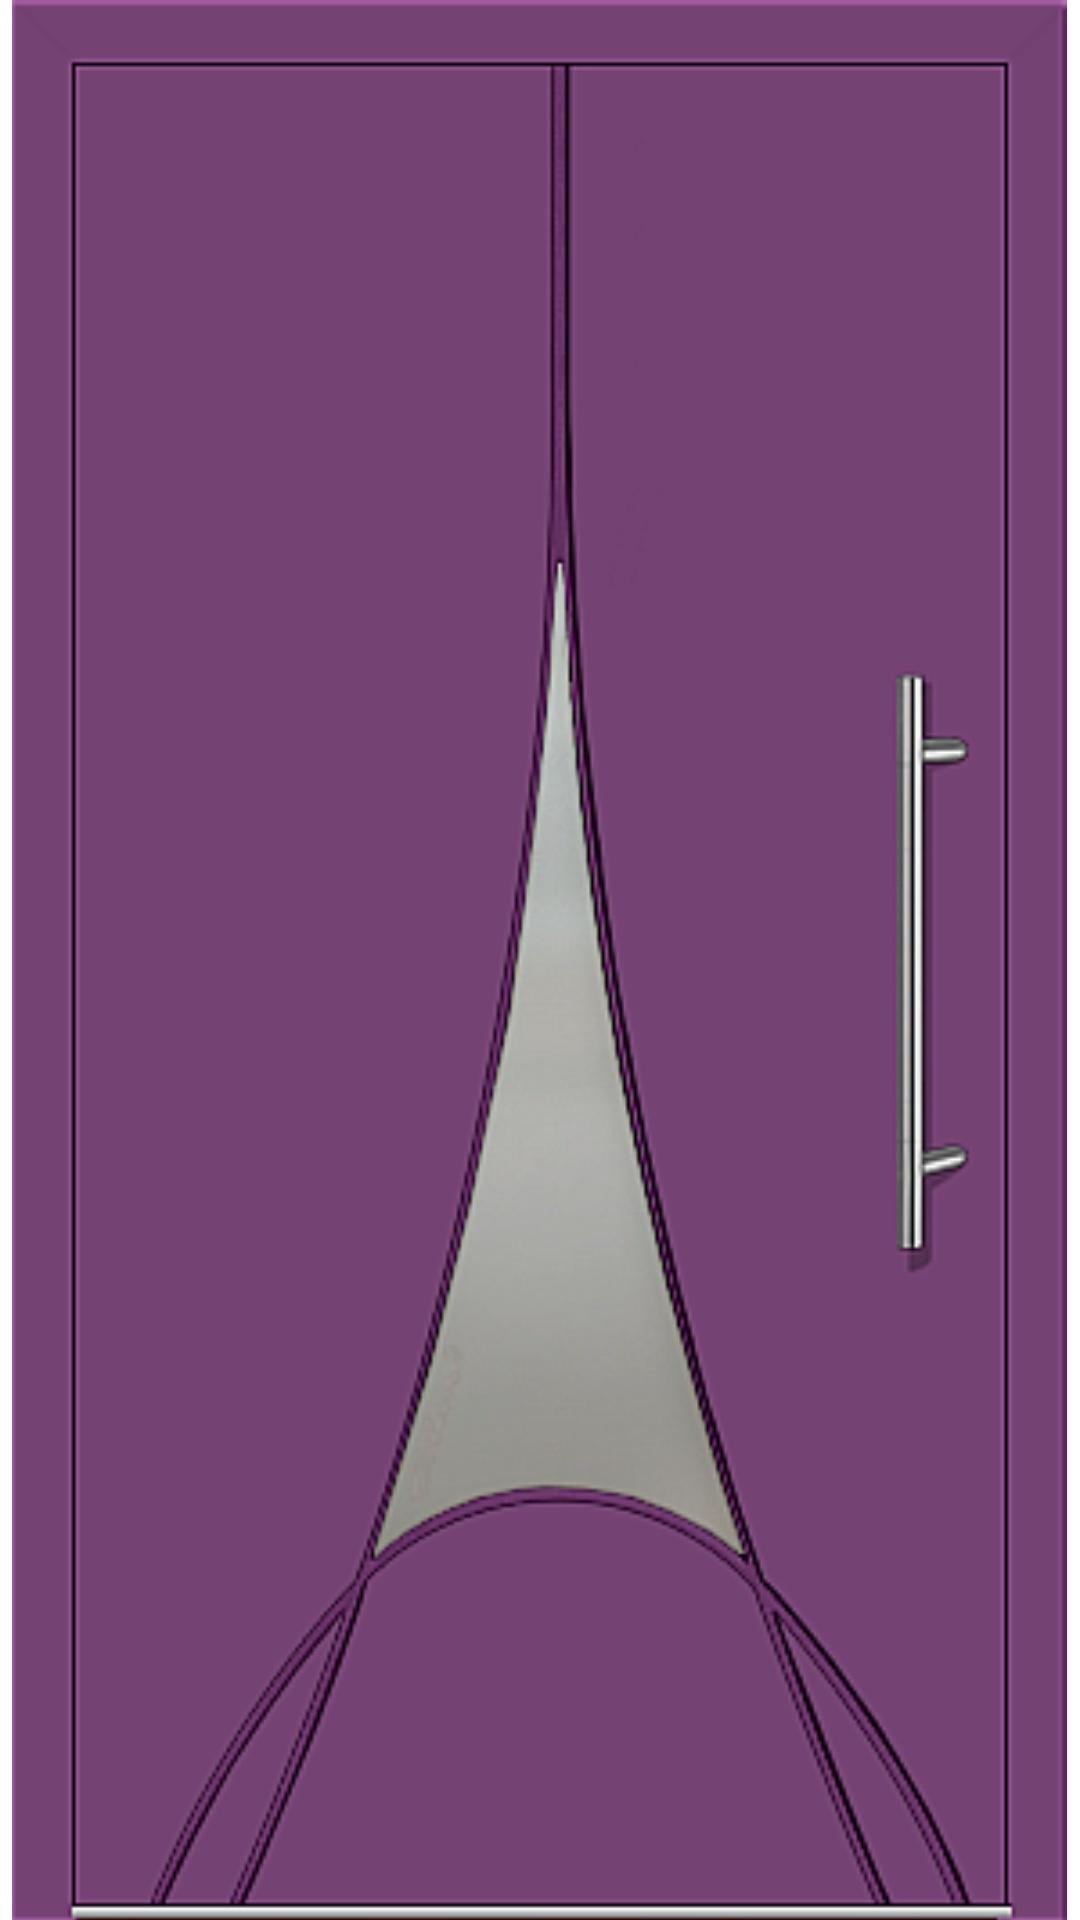 Kunststoff Haustür Modell 6997-41 singalviolett